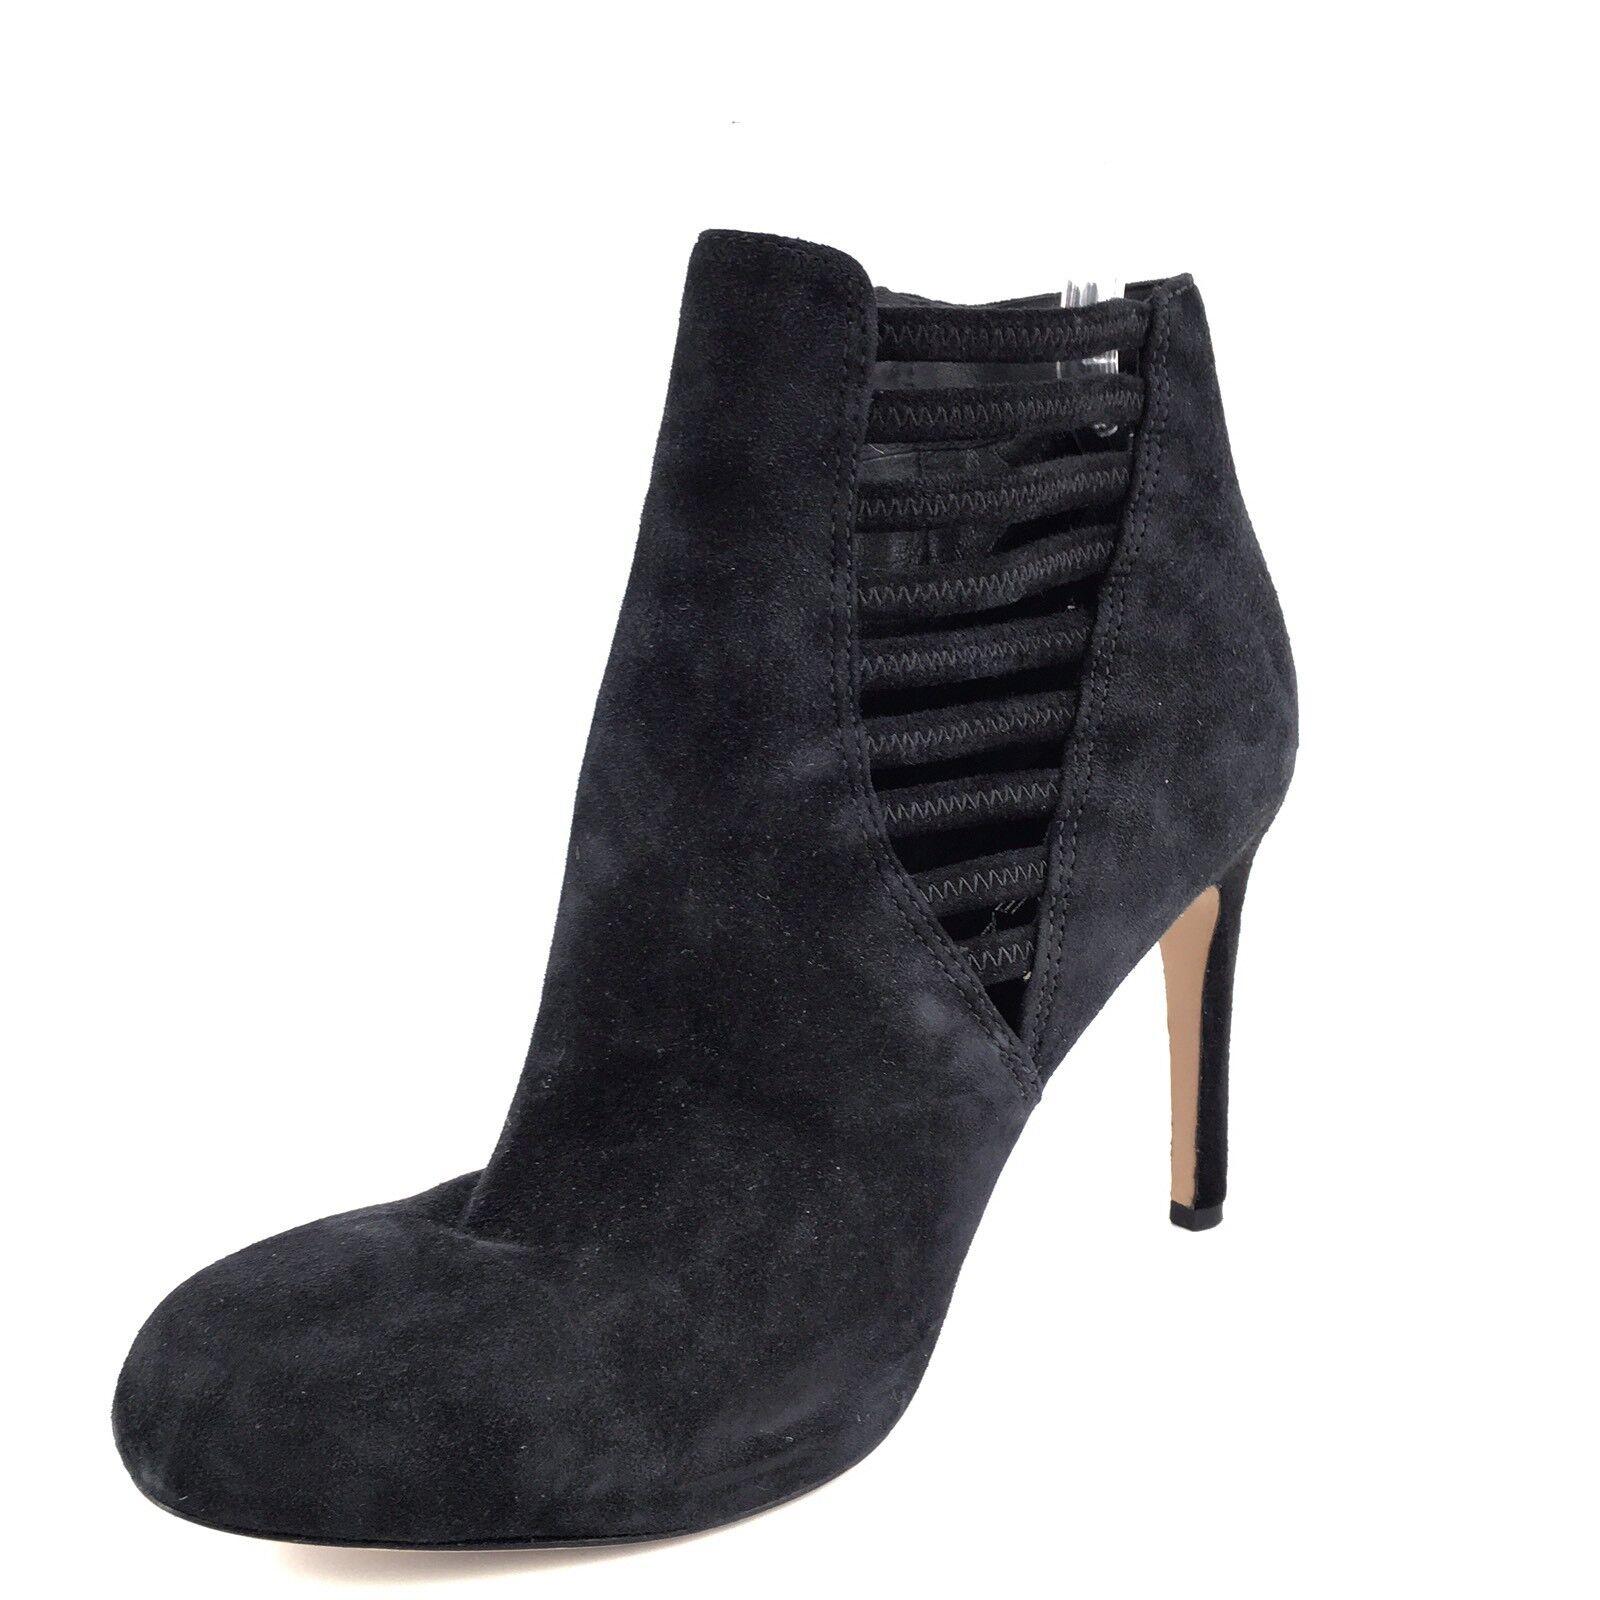 Via Spiga Peak Black Suede Elastic Fashion Ankle Bootie Women's Size 8 M